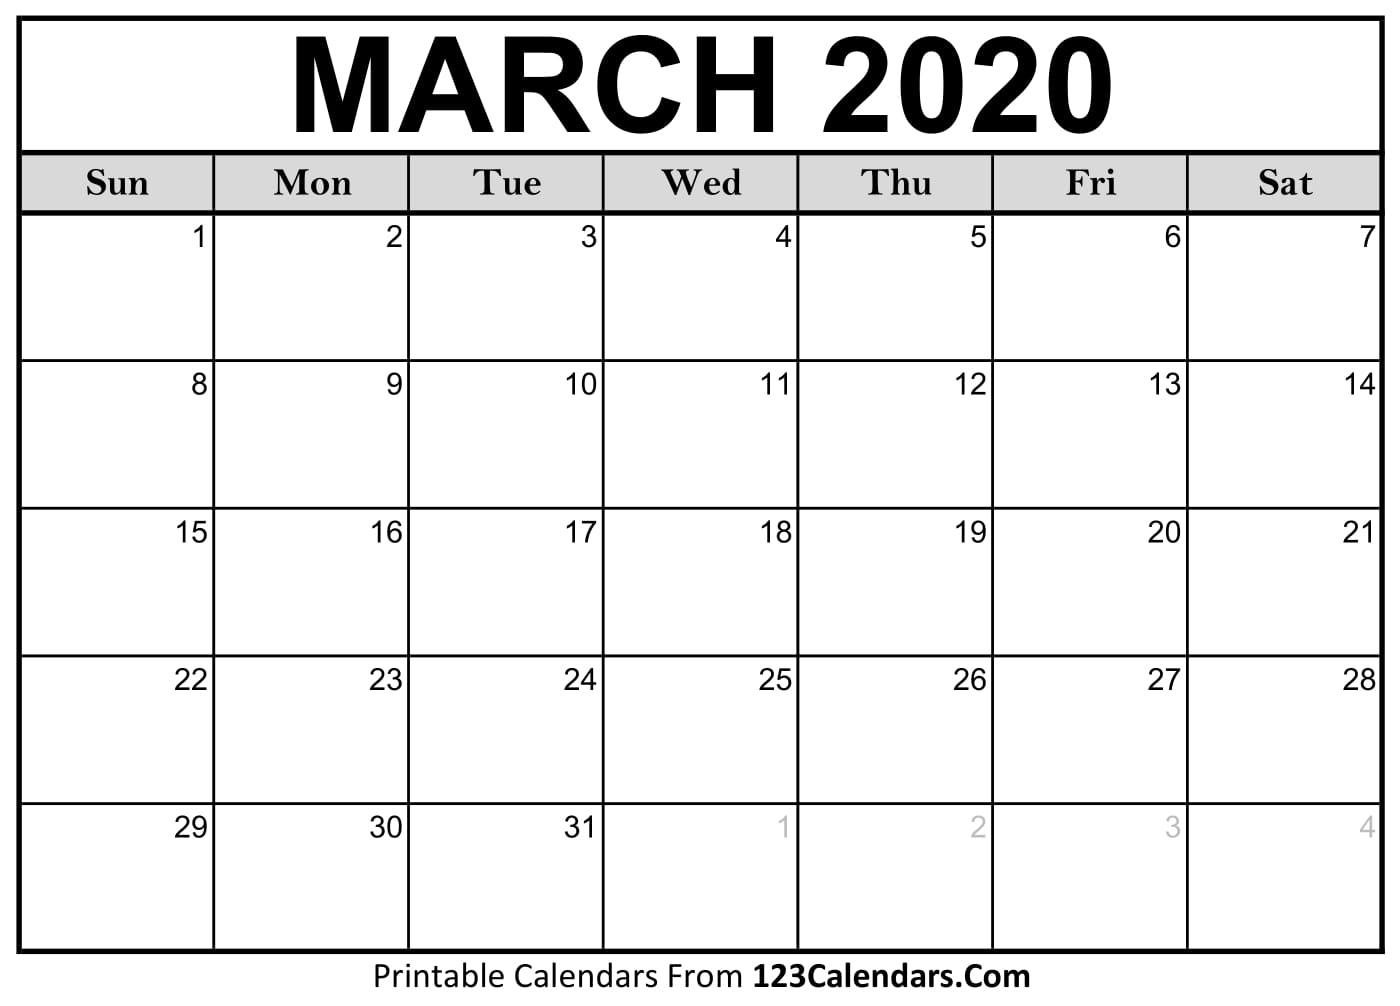 March 2020 Printable Calendar | 123Calendars